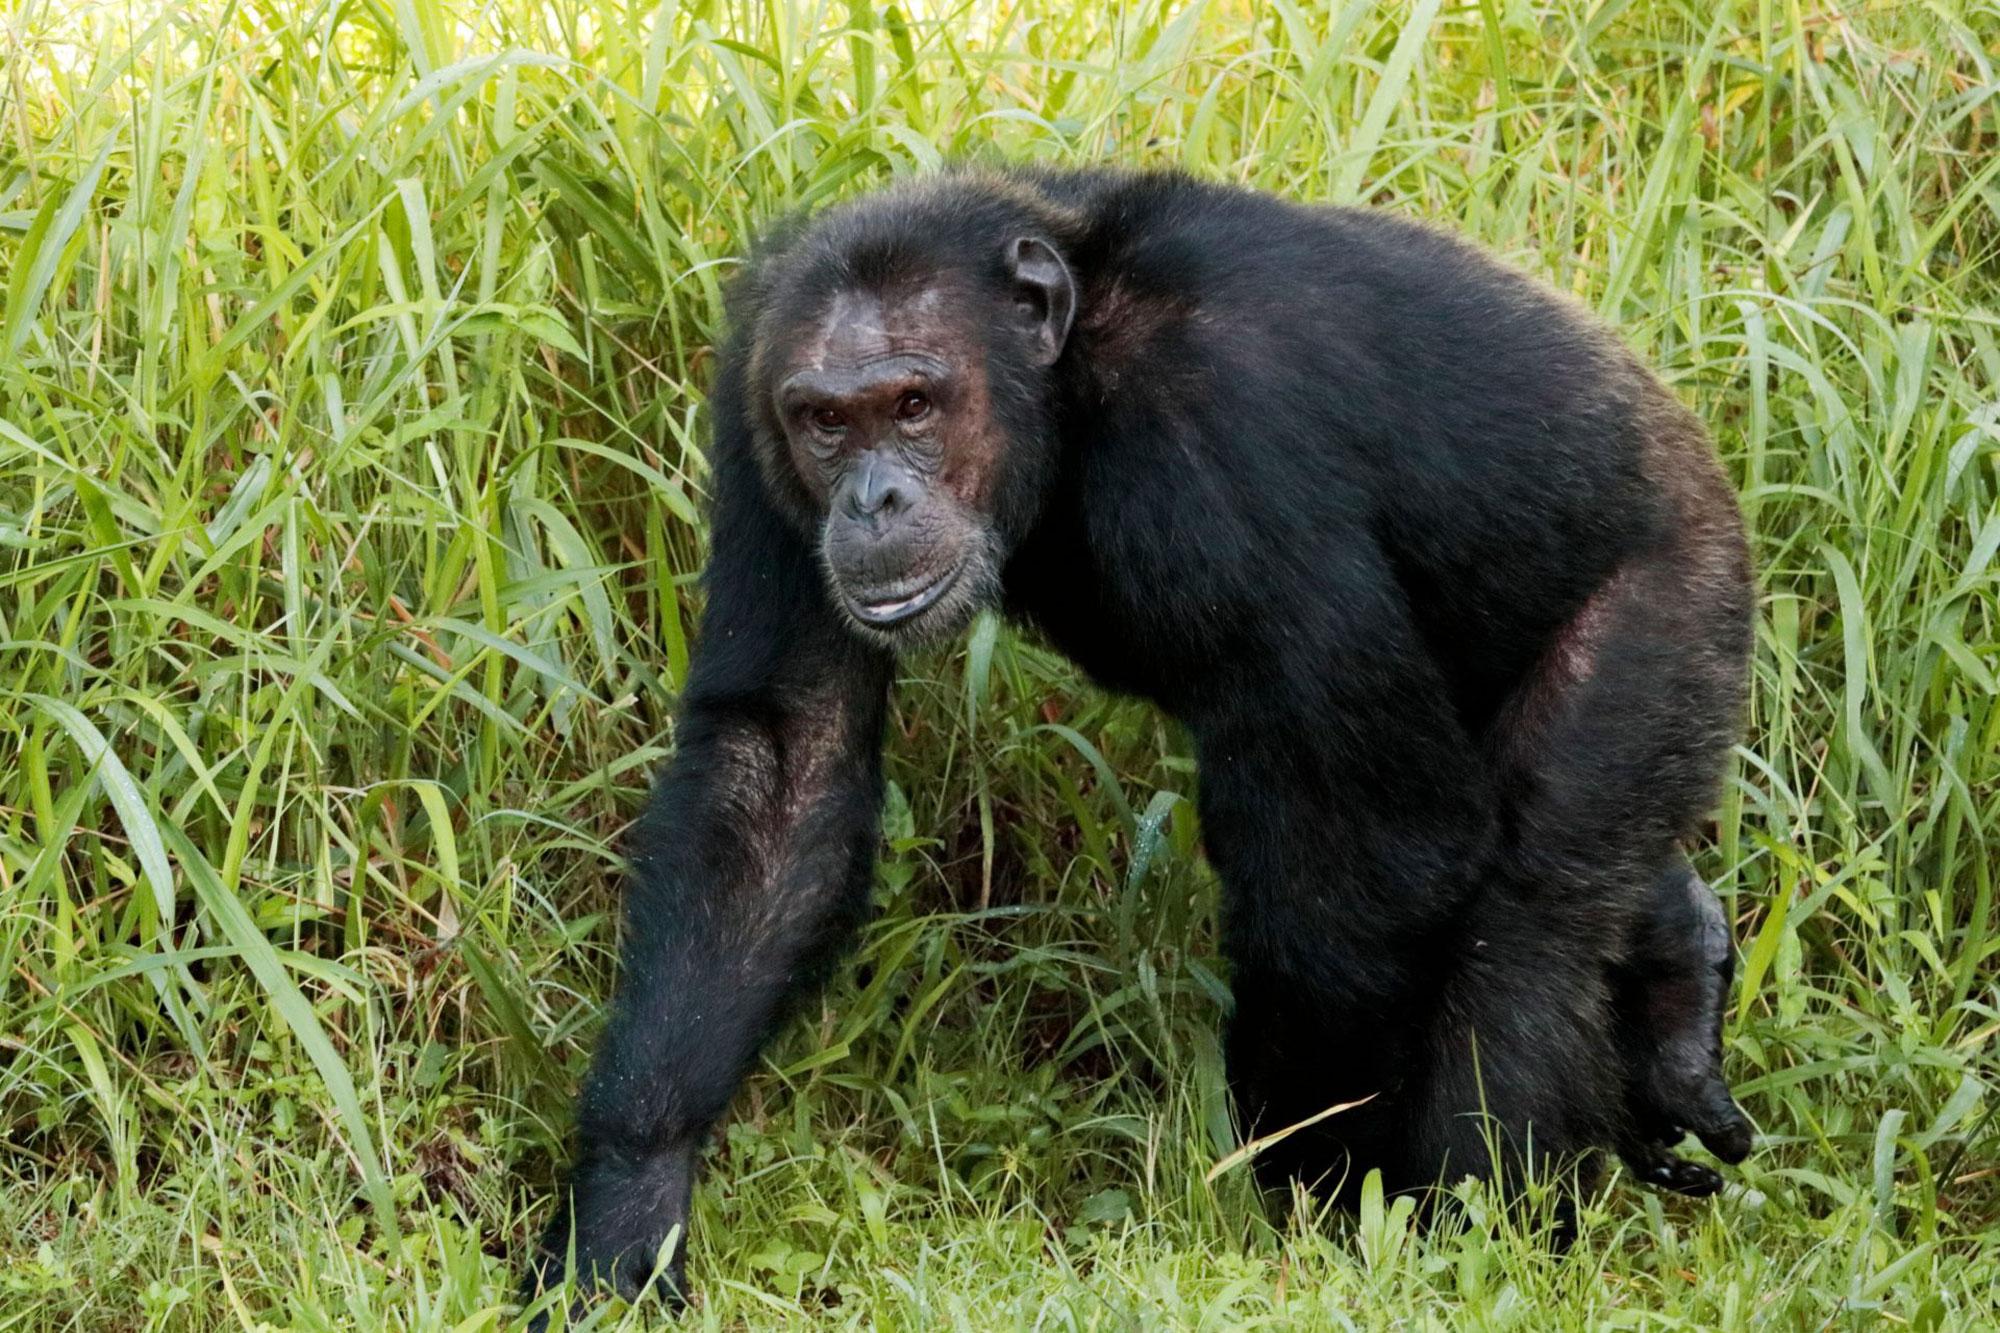 Chimpanzee, Sonso, Uganda